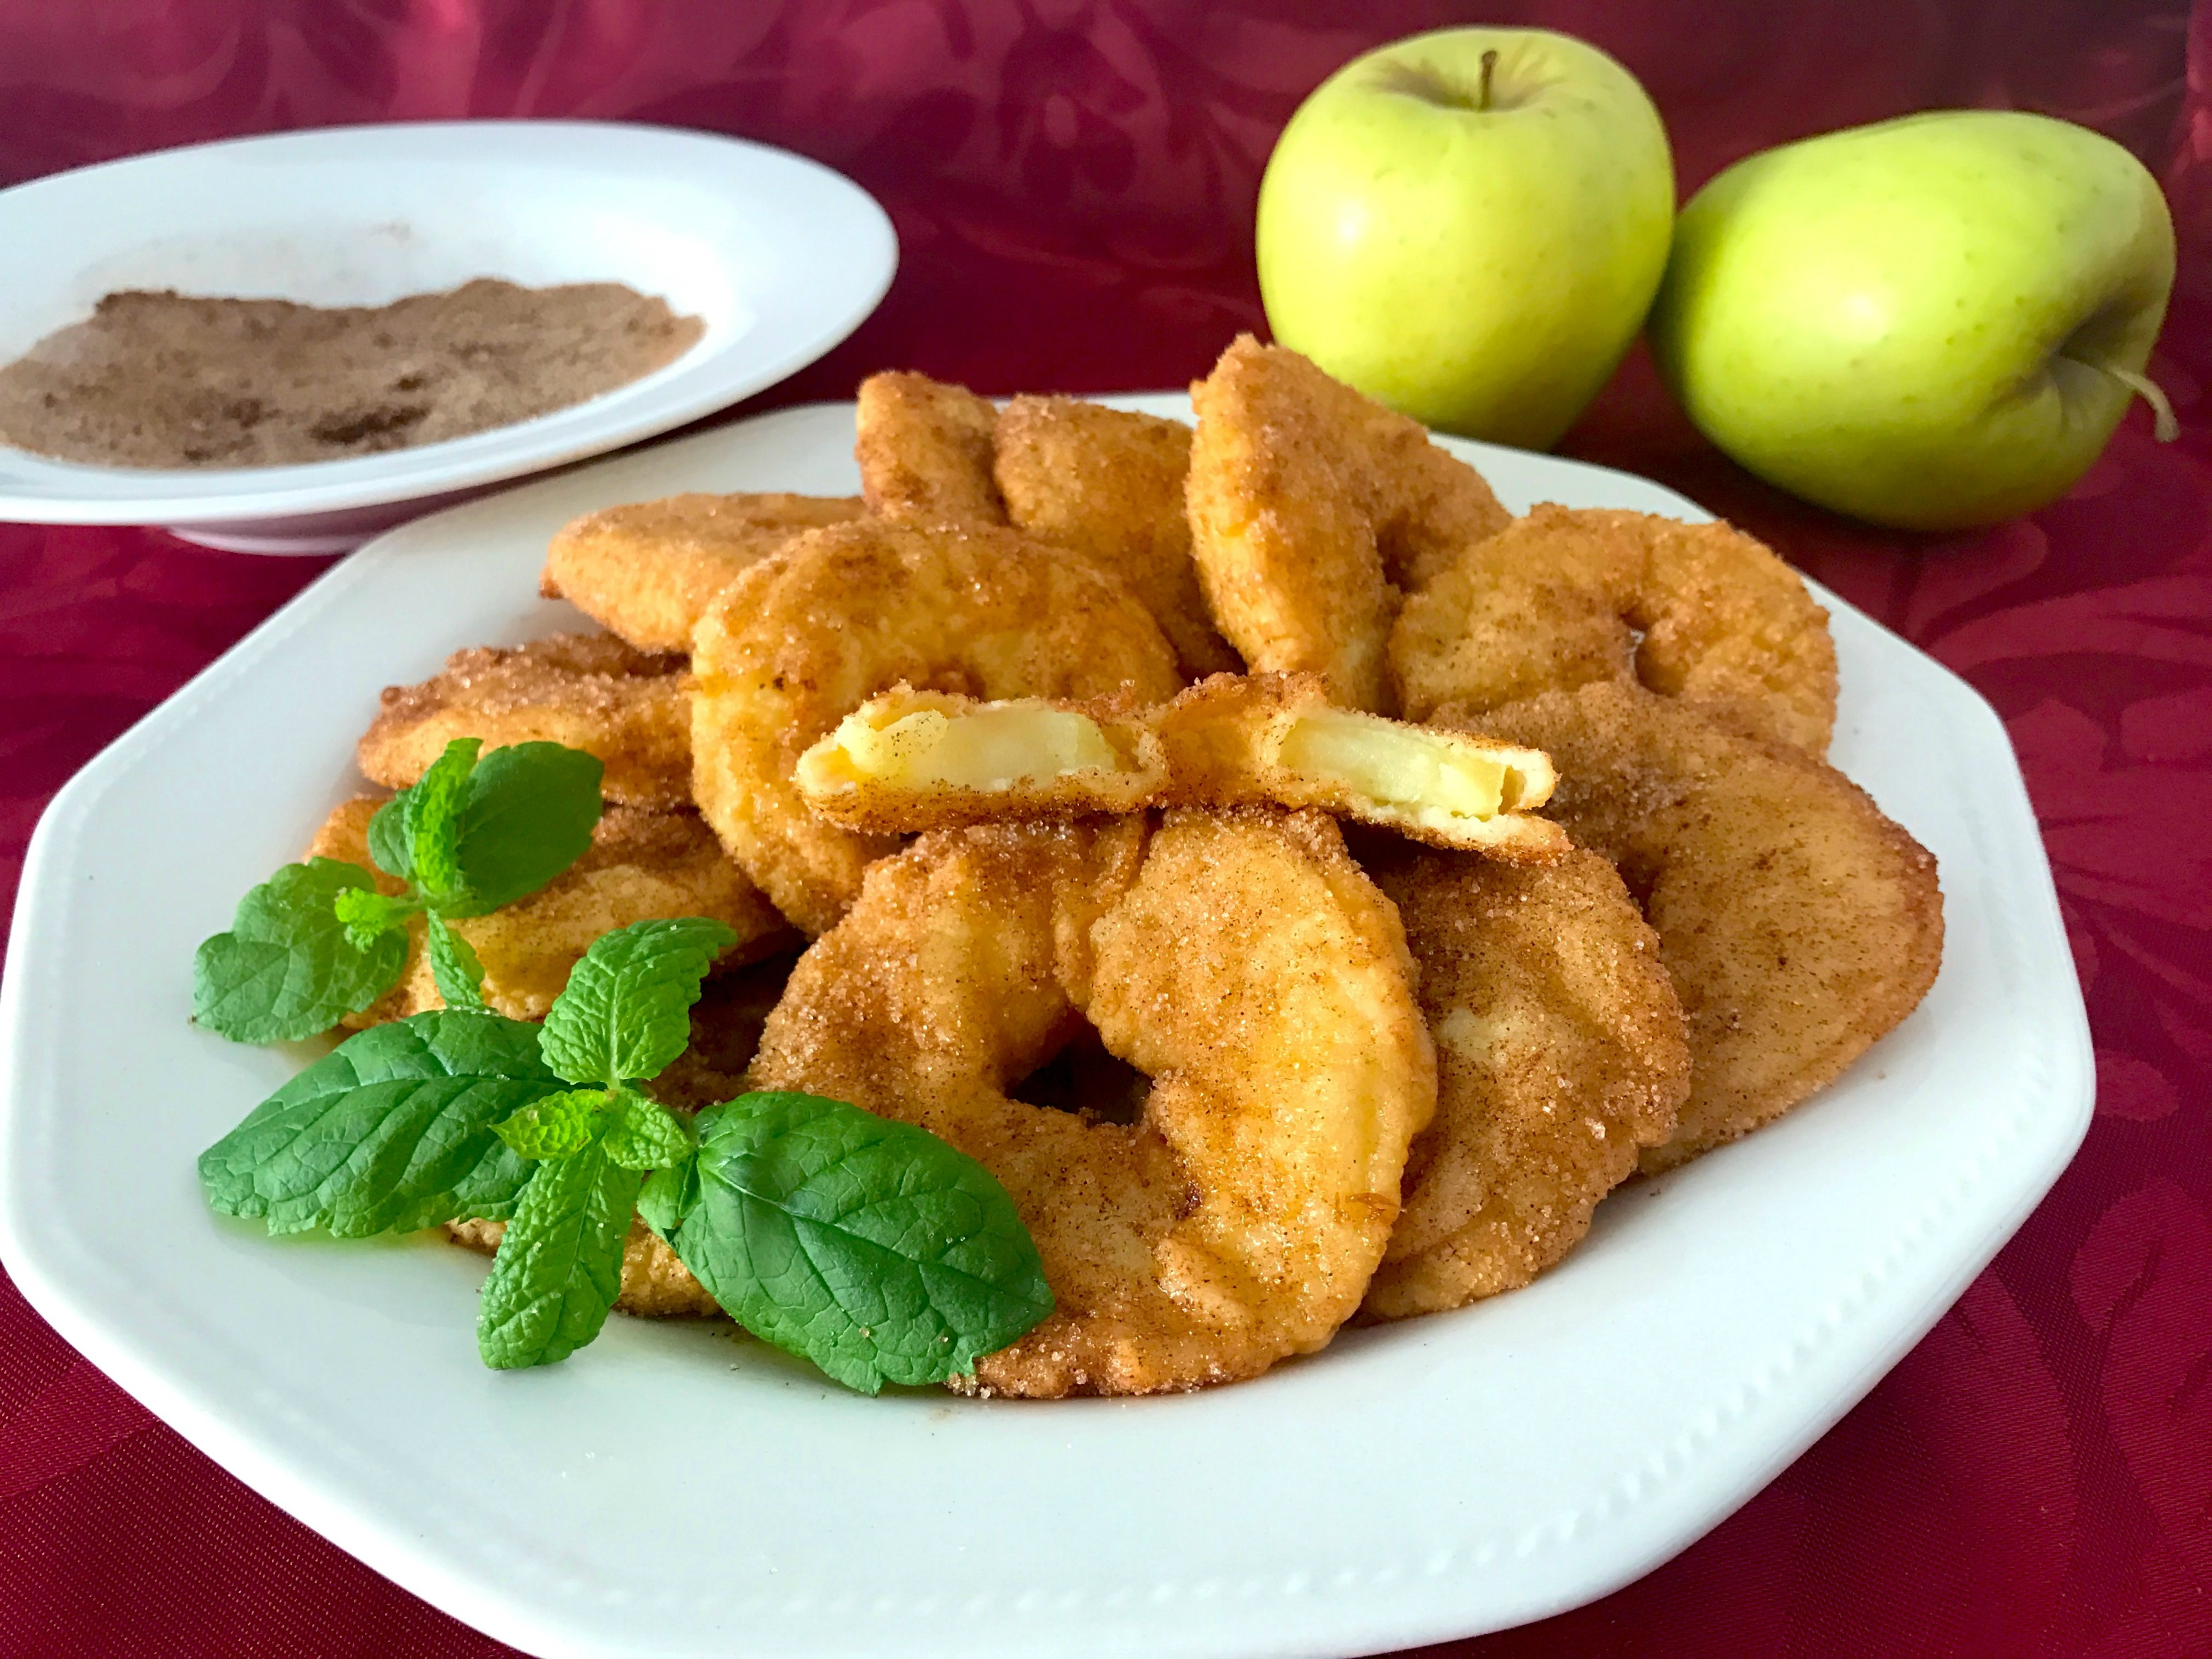 postres de semana santa buñuelos de manzana